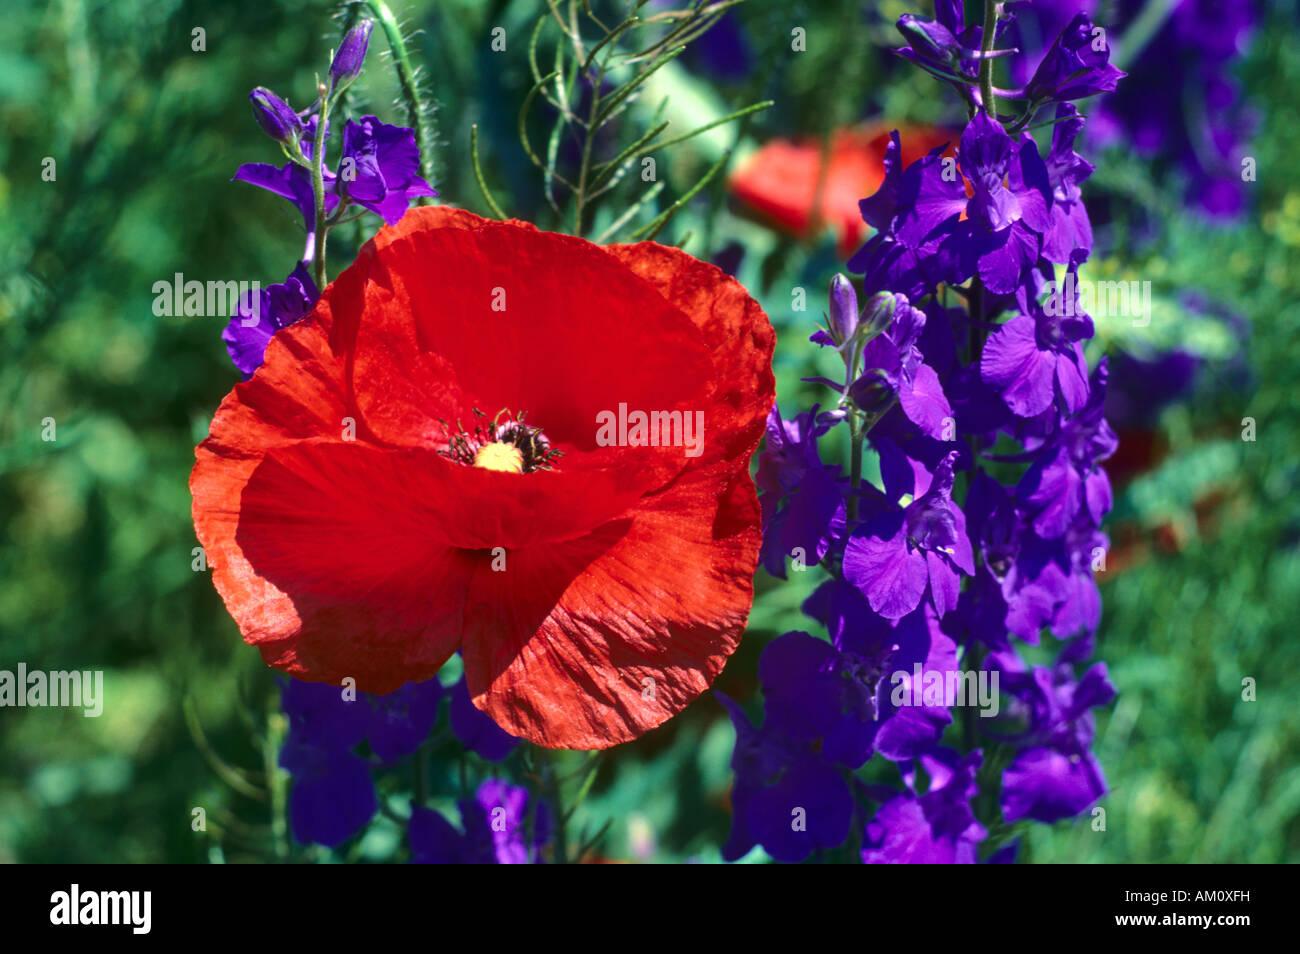 Purple Delphinium Stock Photos & Purple Delphinium Stock Images - Alamy